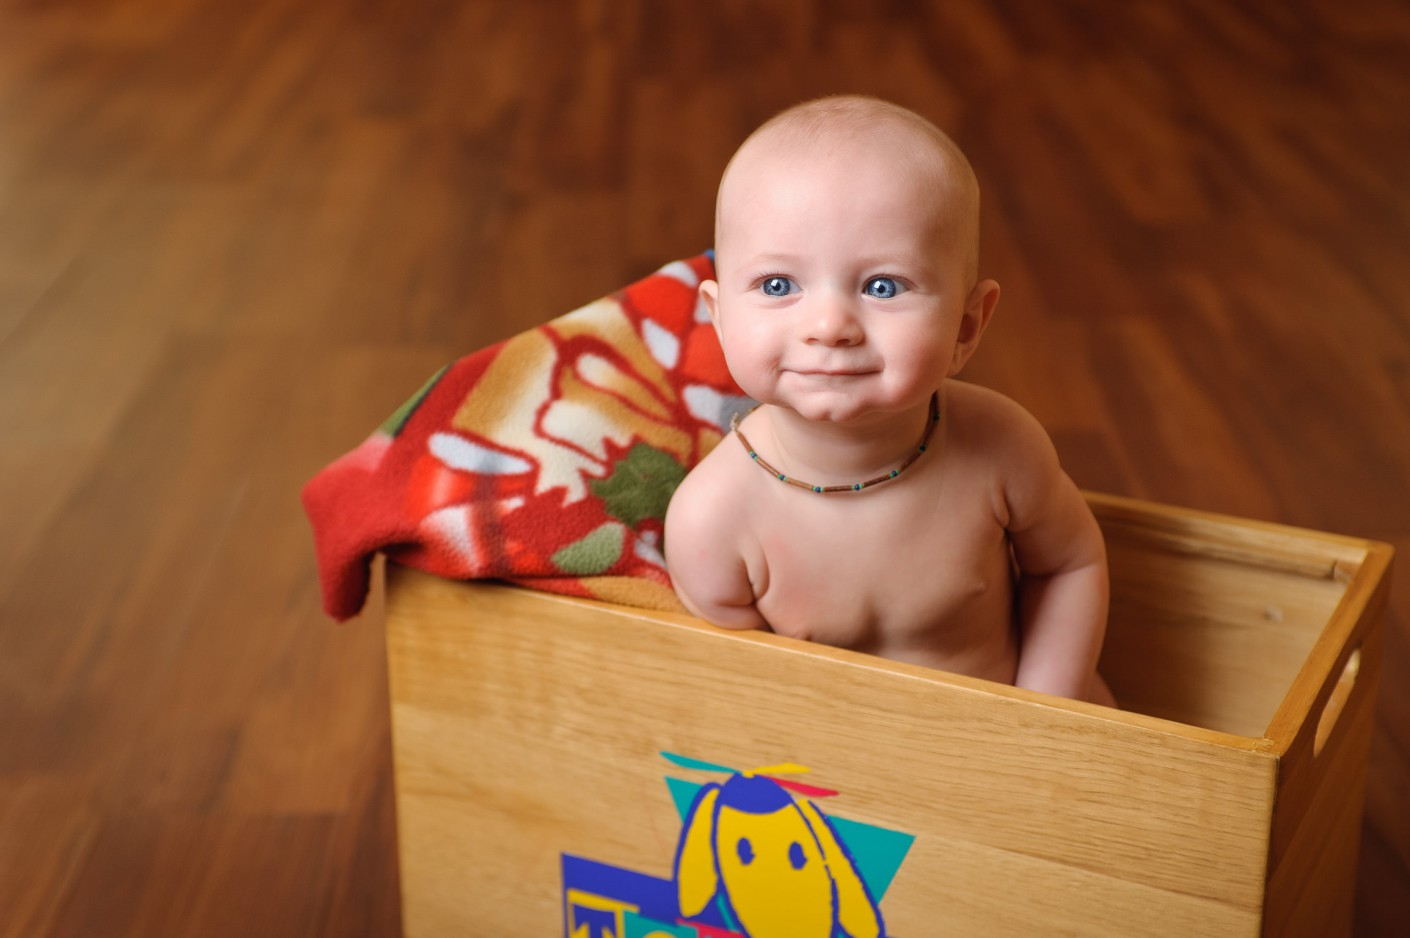 Bébé : Le regard d'azur de Tom